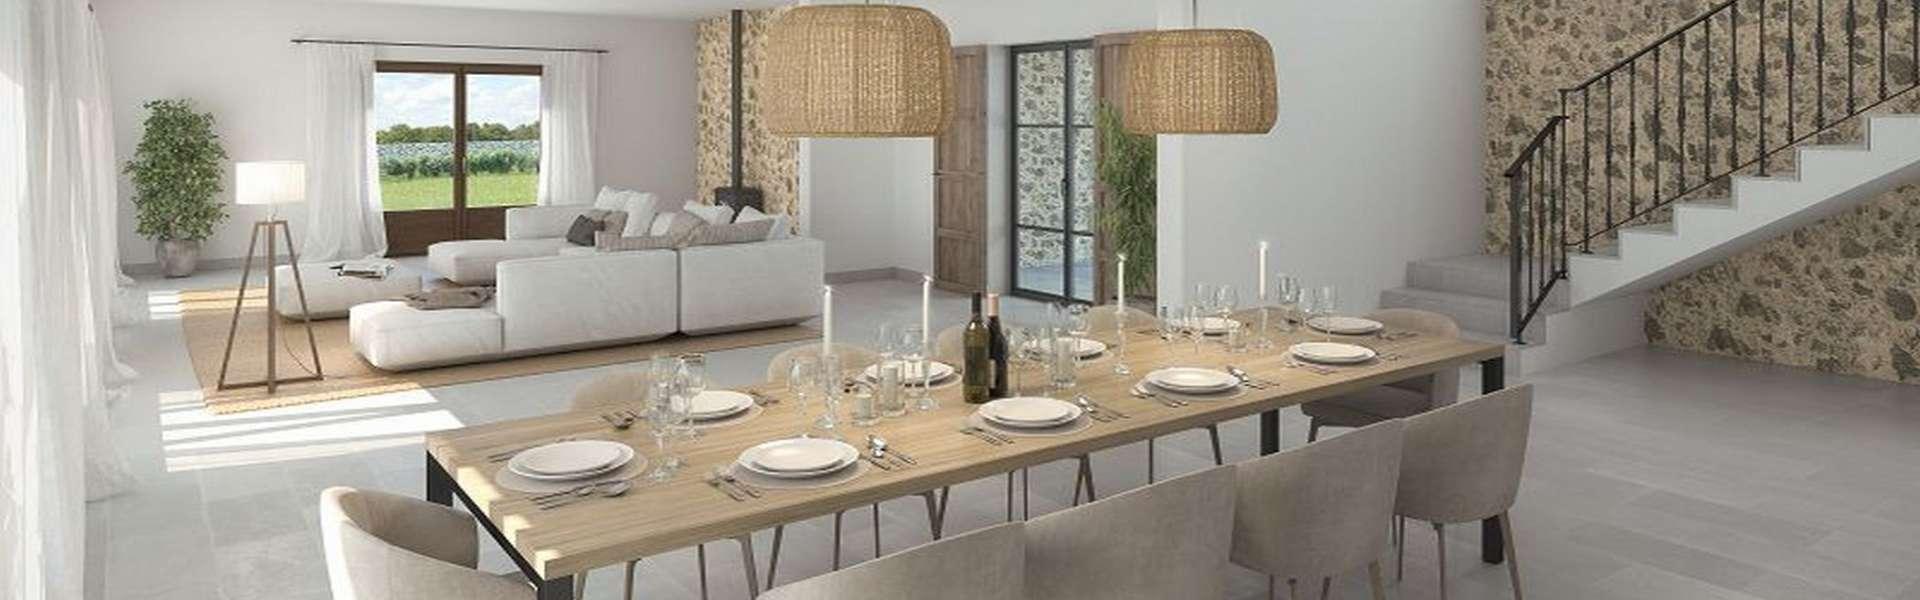 Alqueria Blanca - Geschmackvolle Neubaufinca mit Weitblick